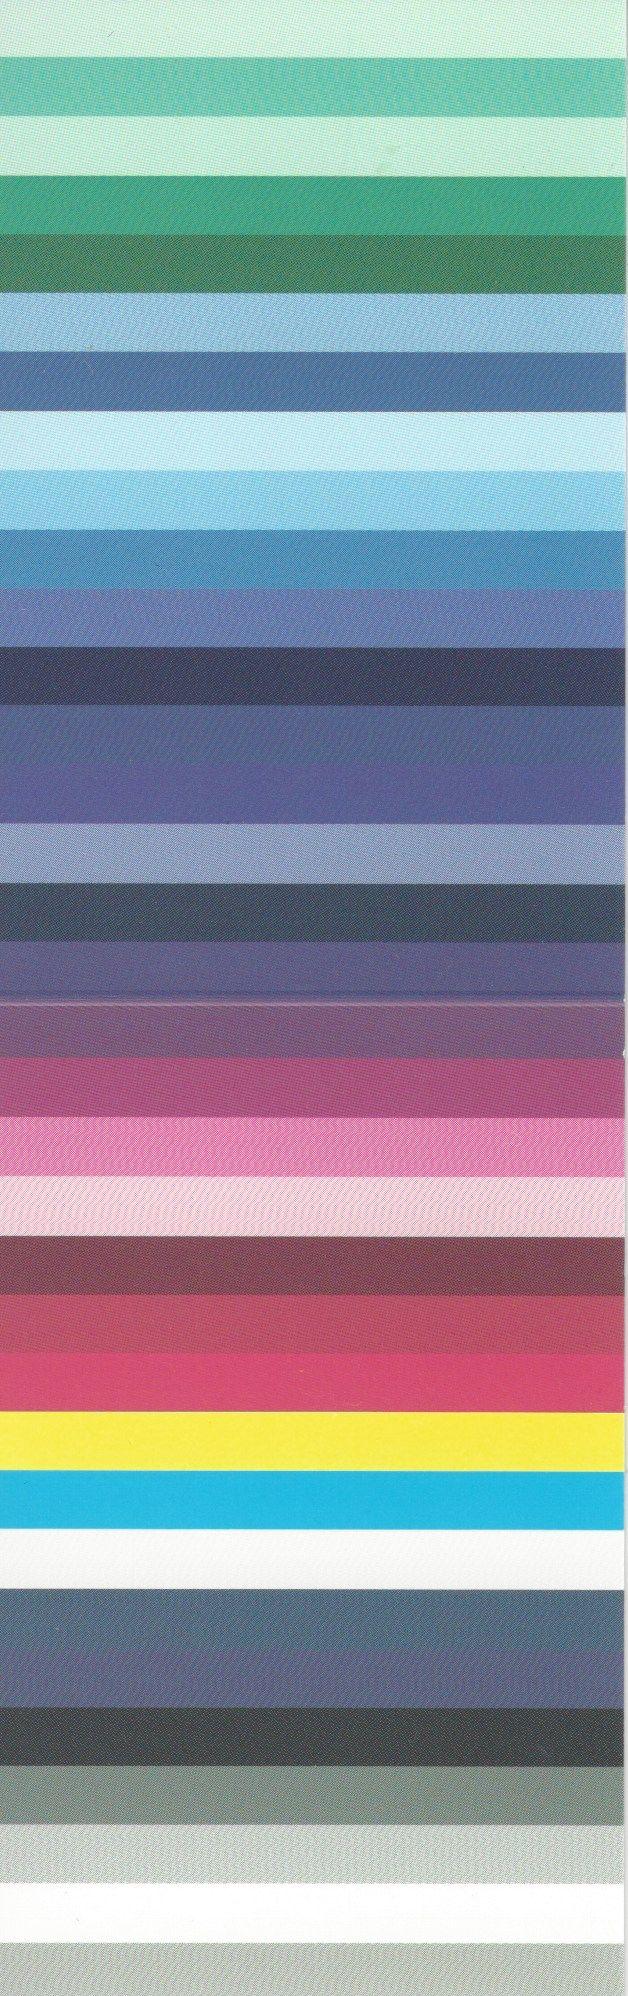 kuhles weiss als dekofarbe meisten abbild der dbcadddfd color card winter colors